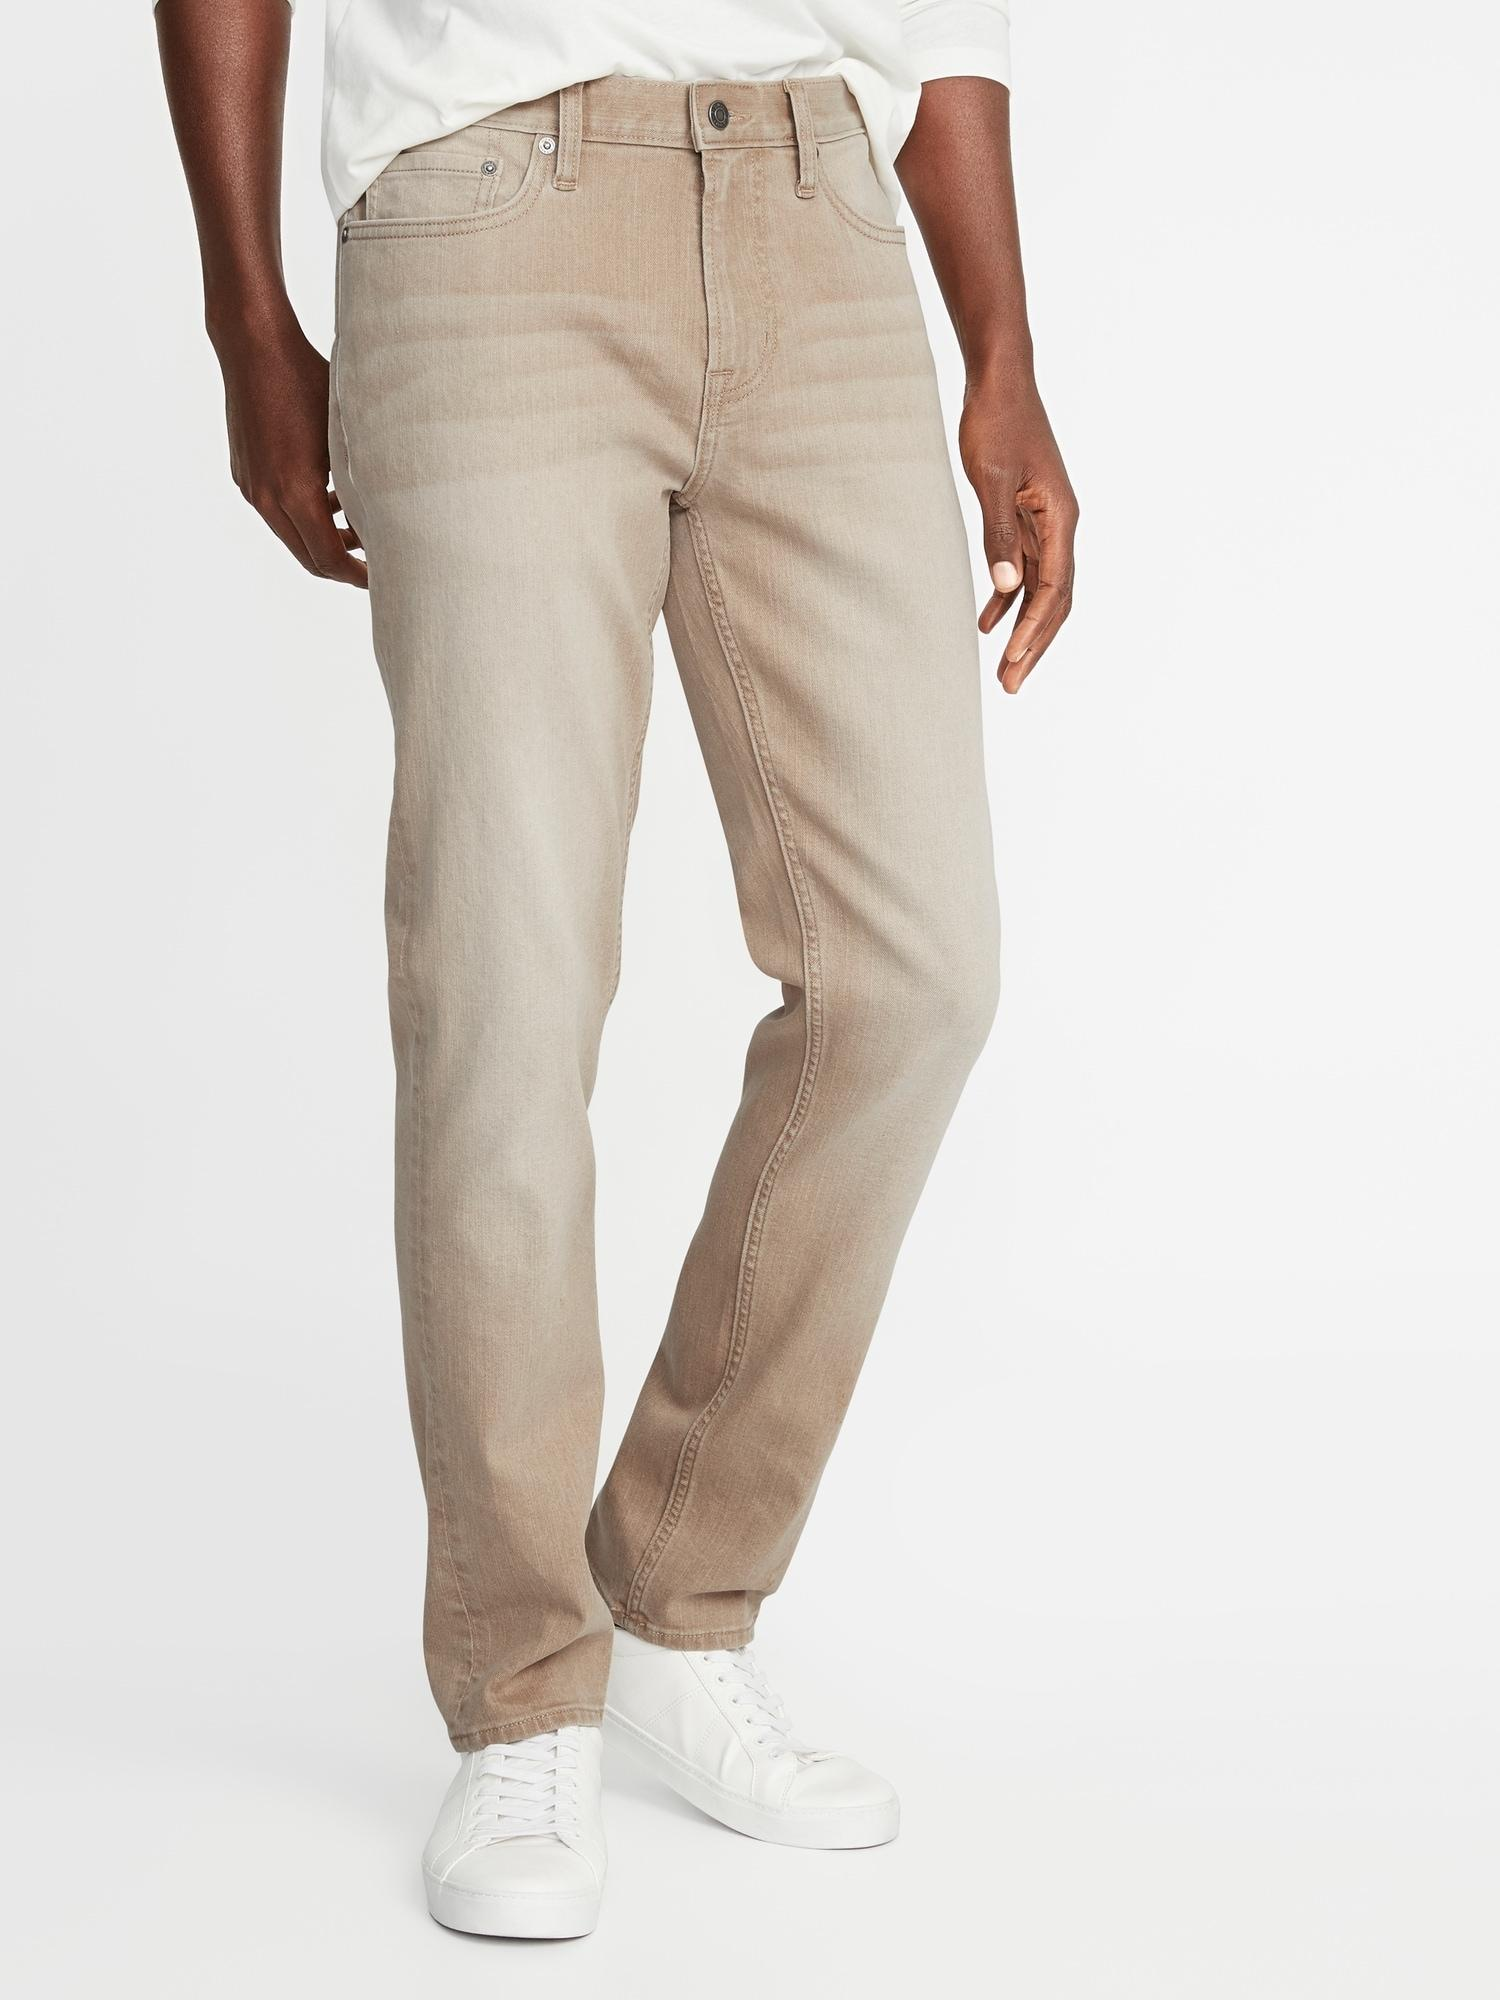 Lyst - Old Navy Slim Built-in Flex Khaki-wash Jeans in ...